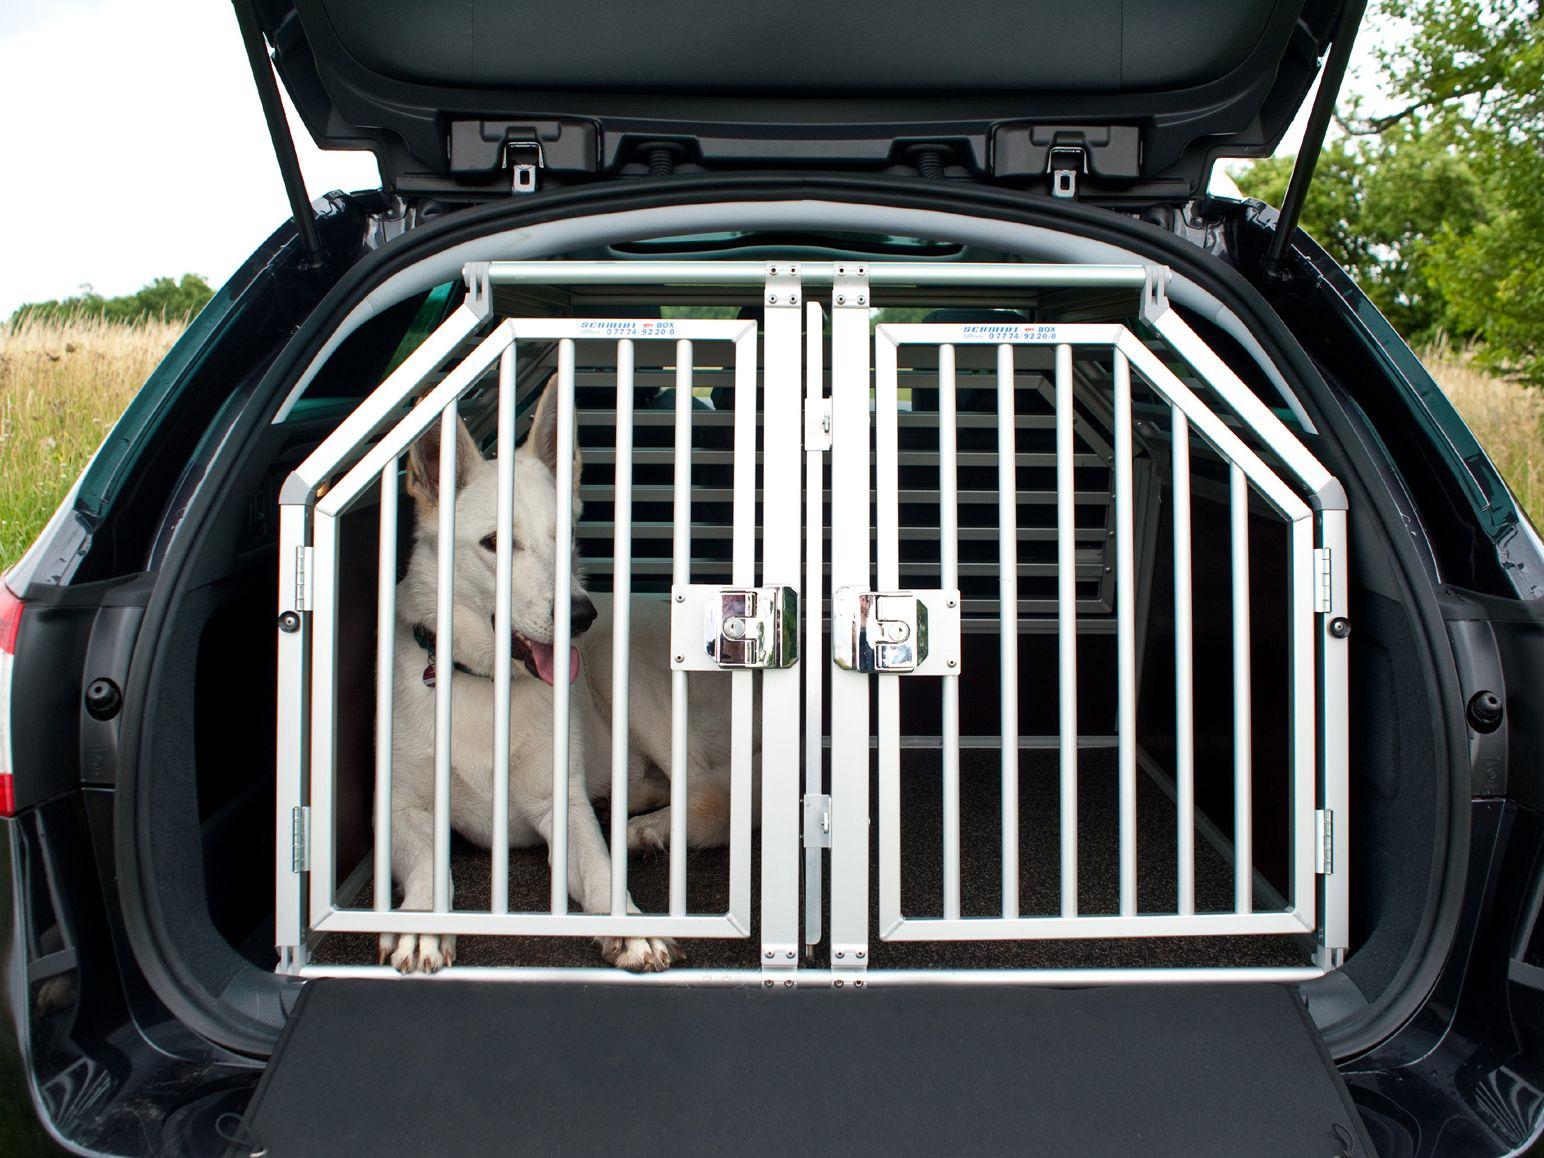 Hund in Transportbox